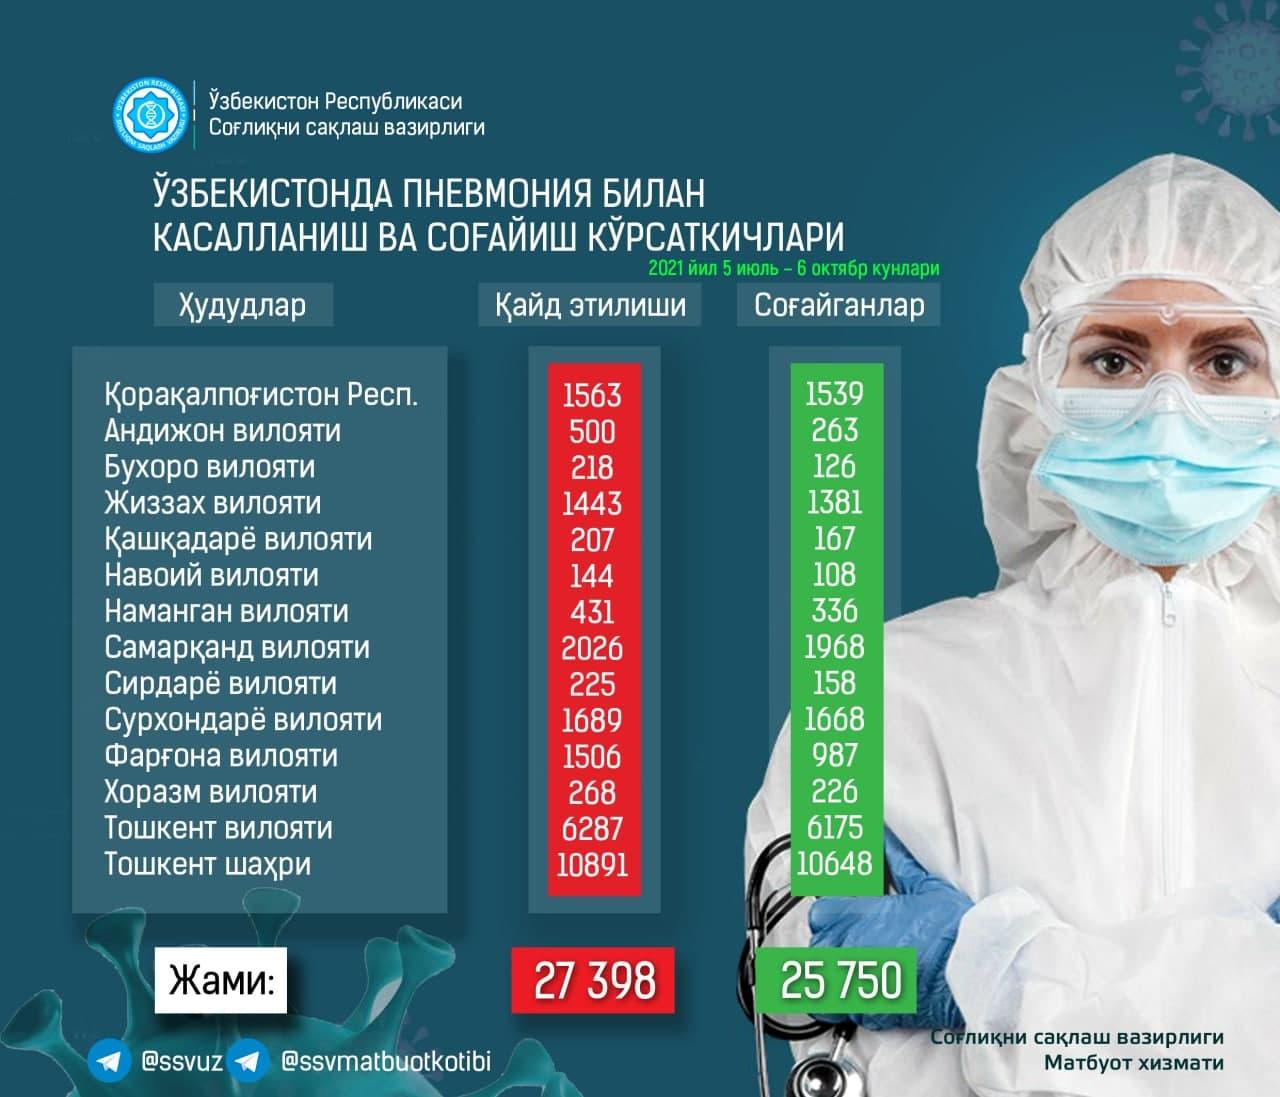 За сутки лишь 26 человек подхватили пневмонию — статистика